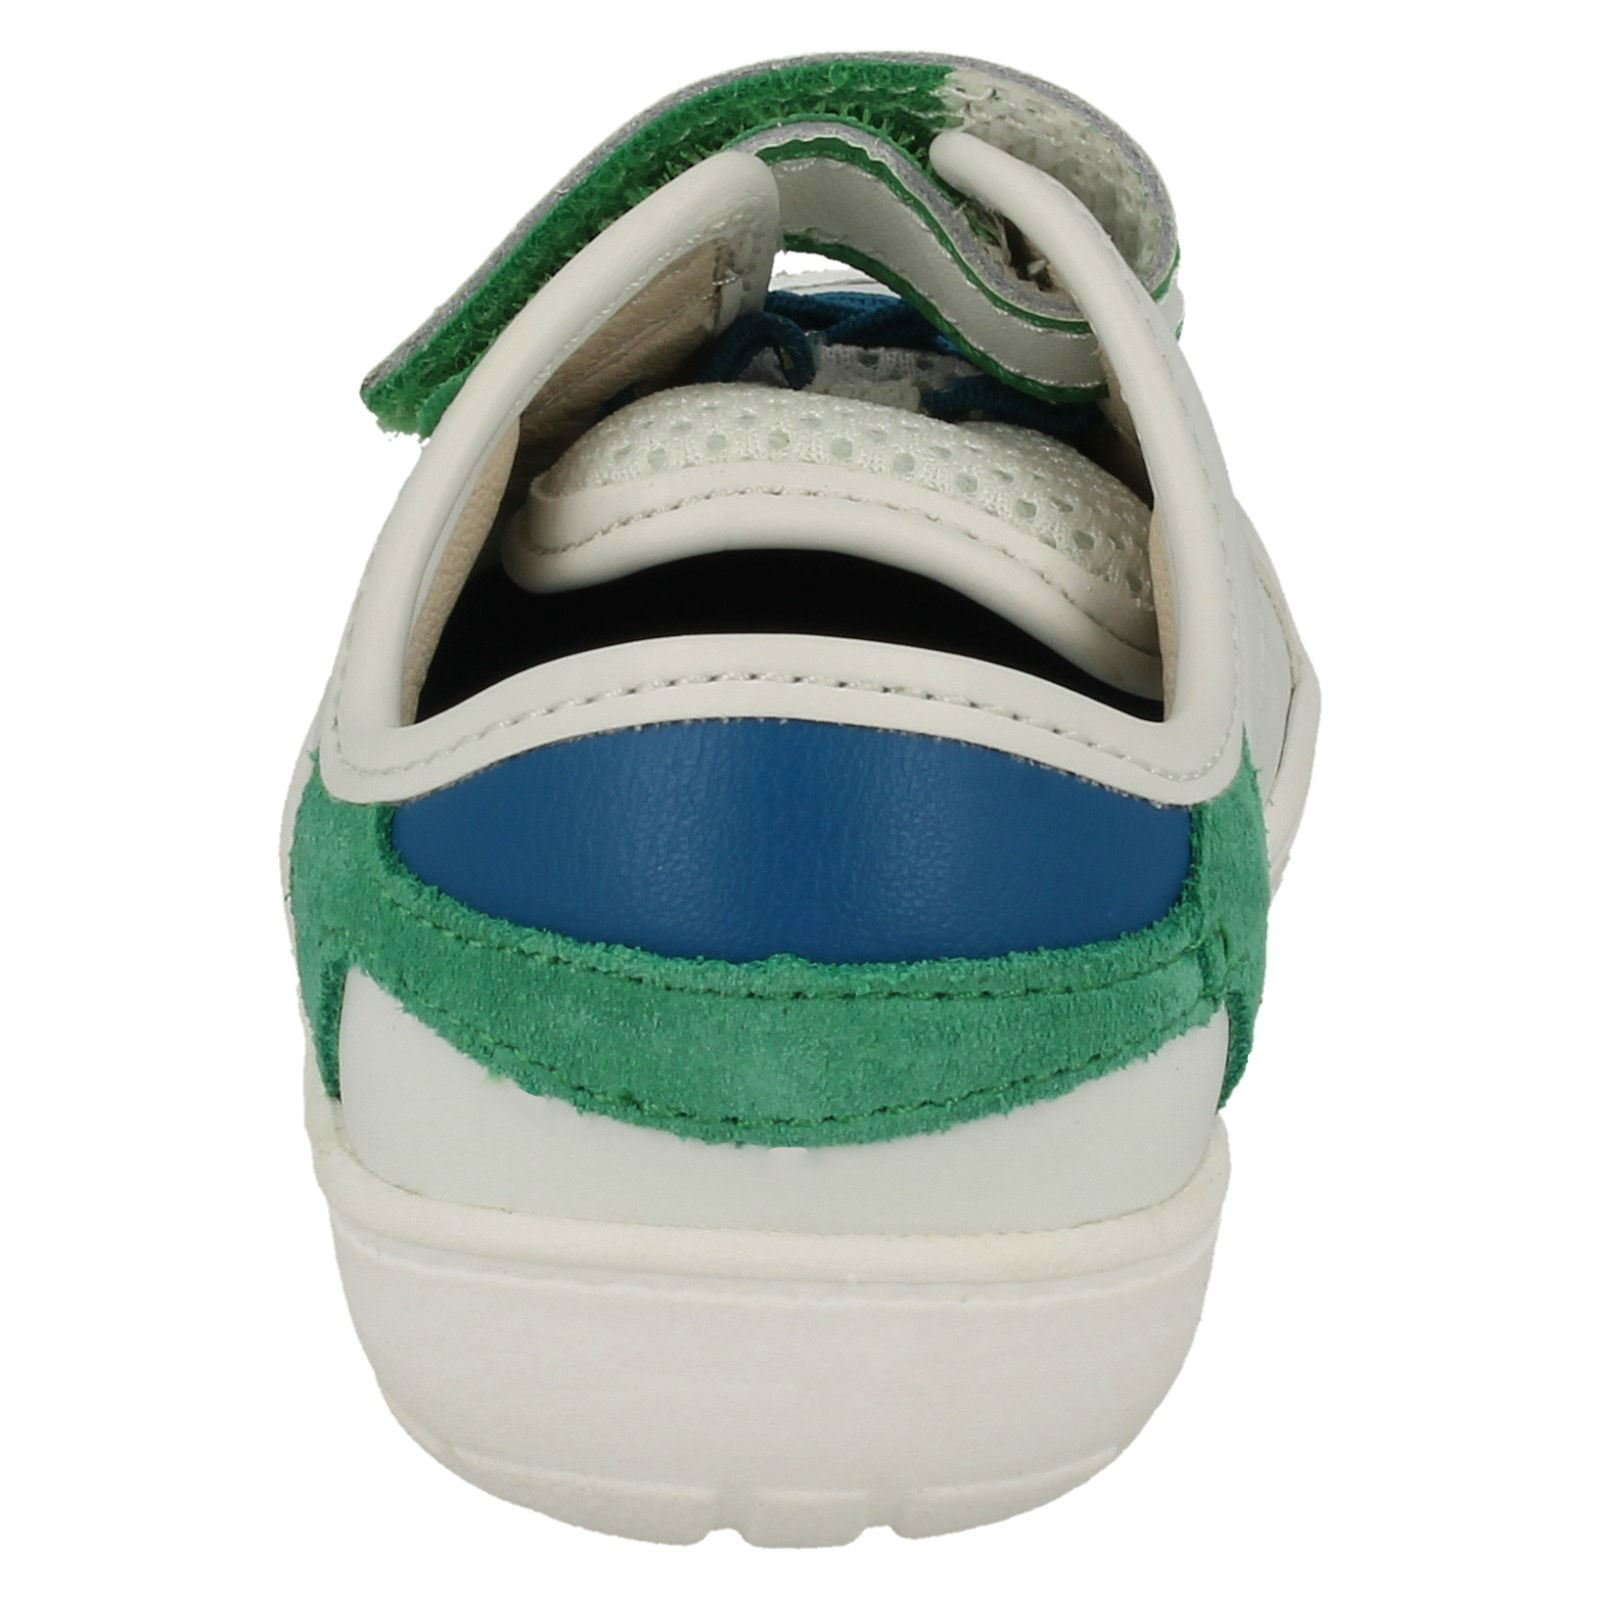 deporte niños Maxi Faux White Lace Clarks Zapatillas Leo de para CAqvwxZ